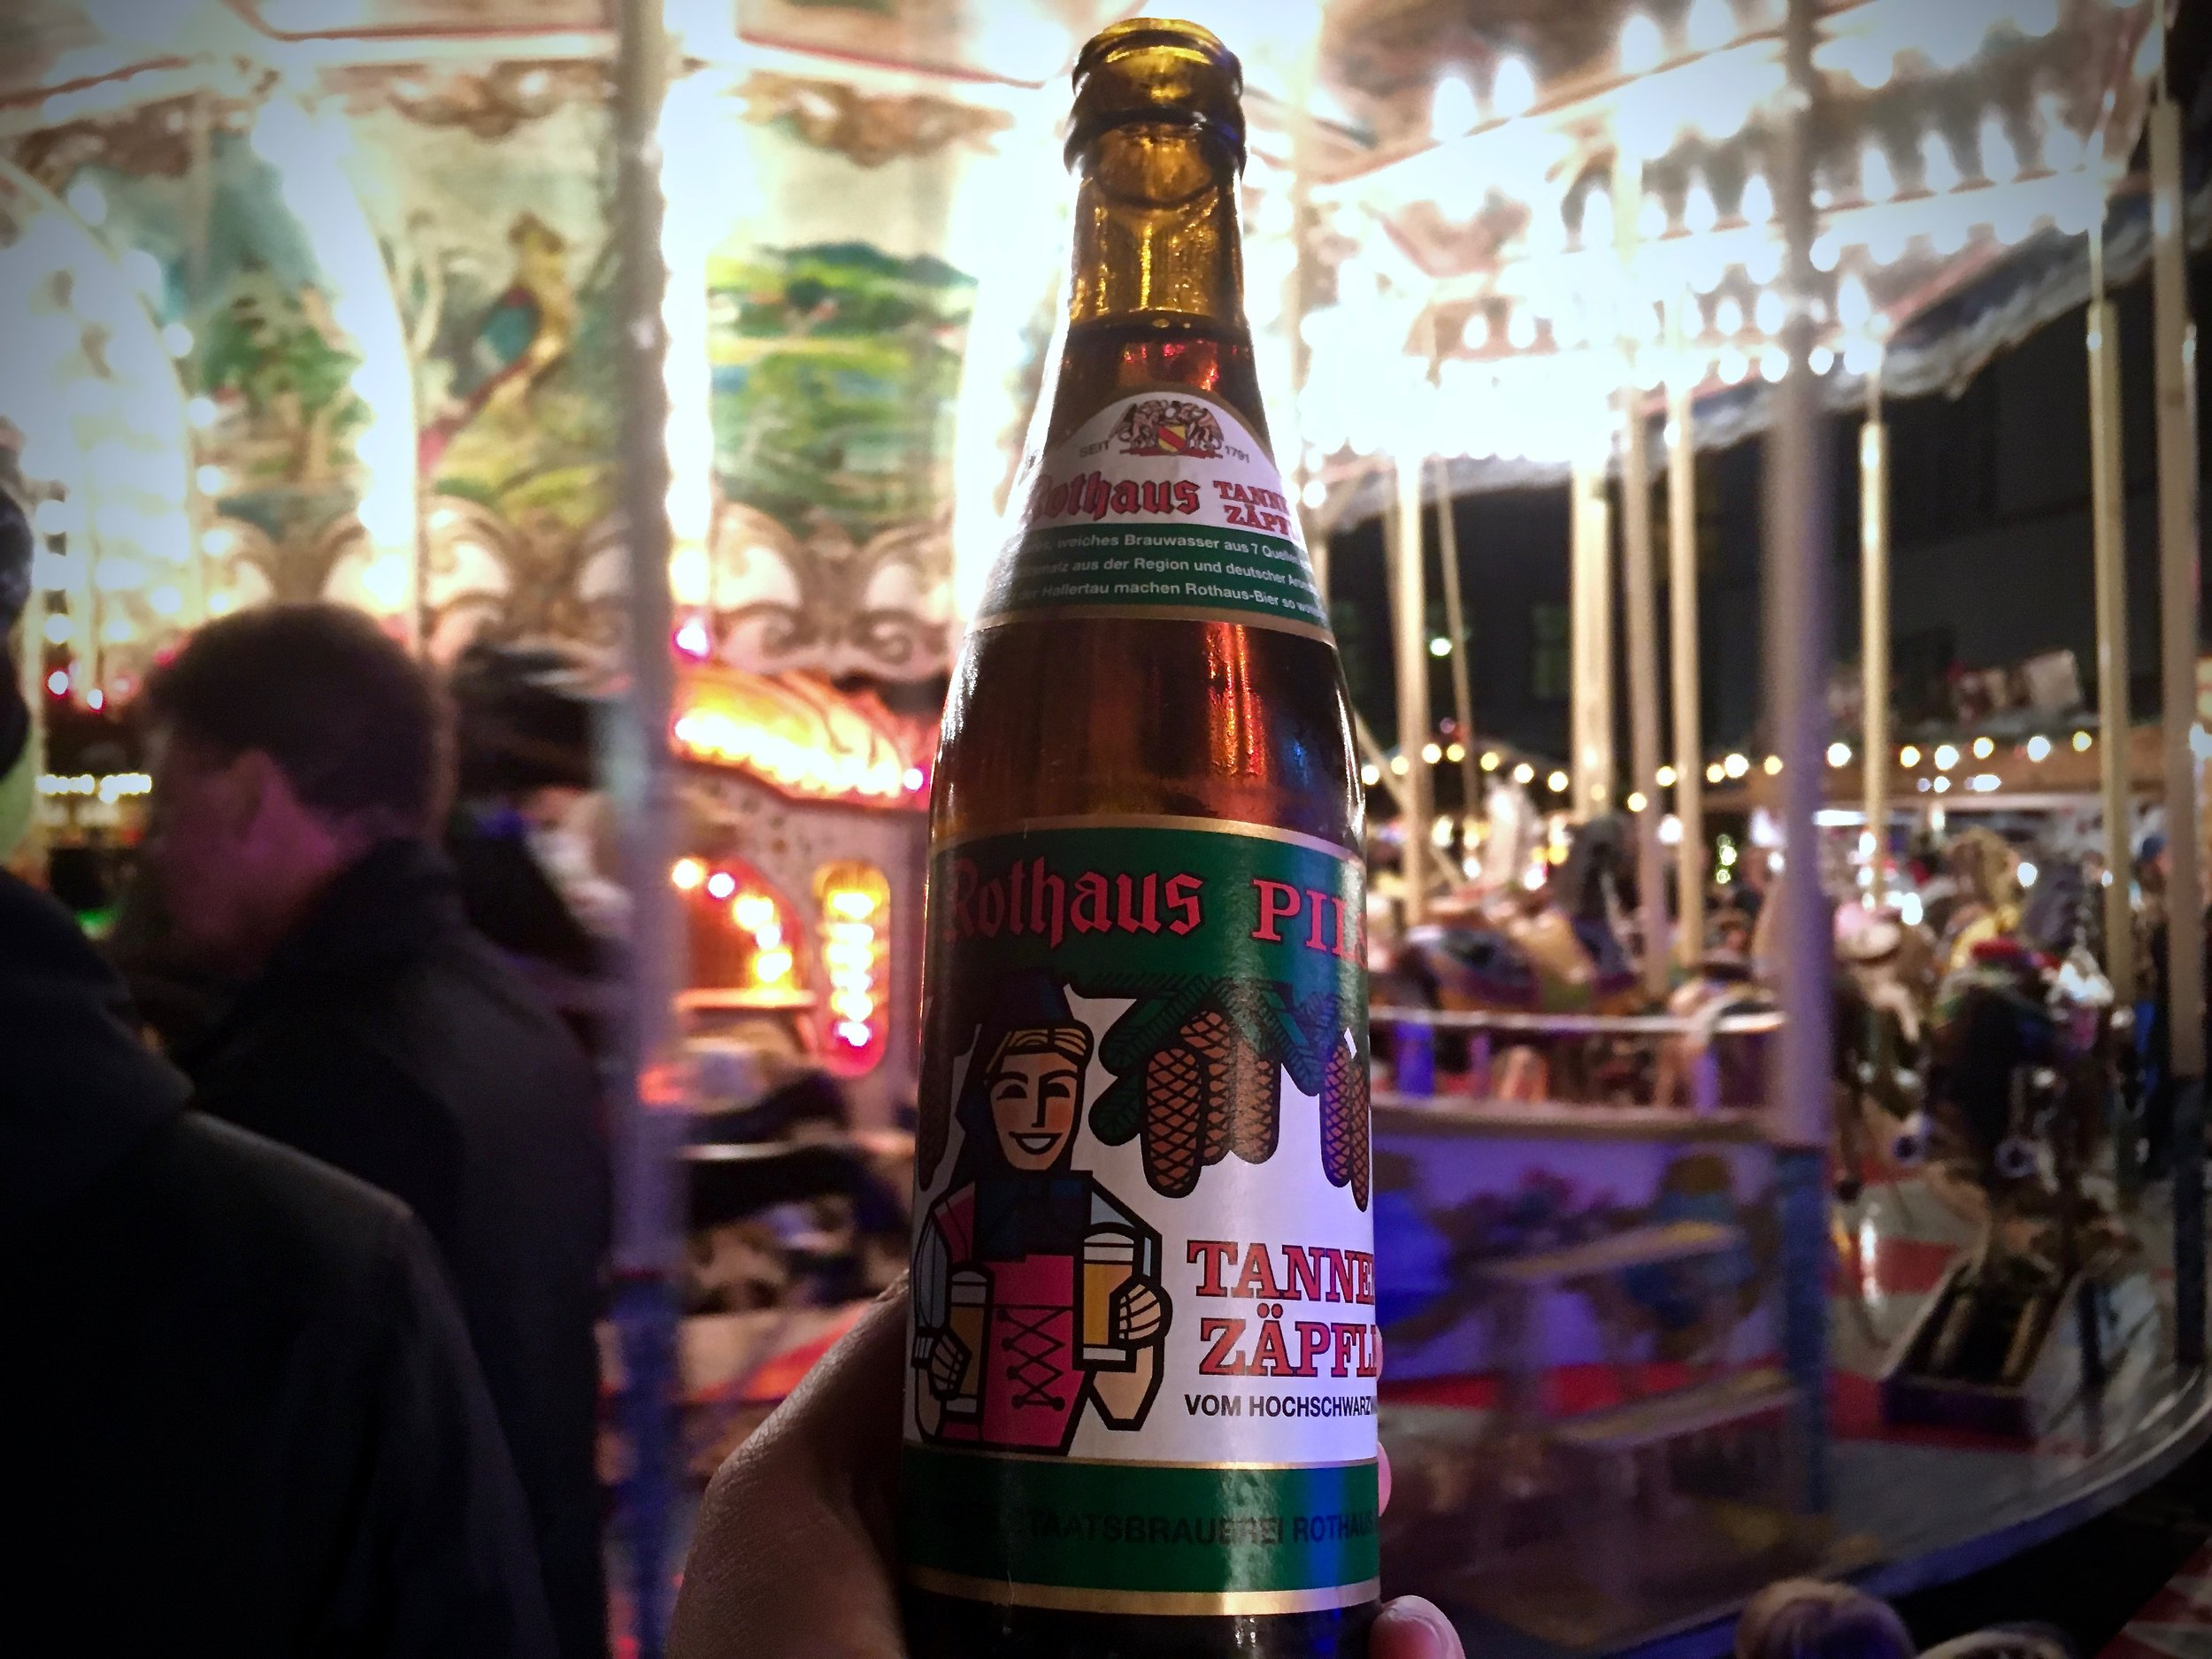 GER_Heidelberg_Rothaus Pils and the Carousel.jpg